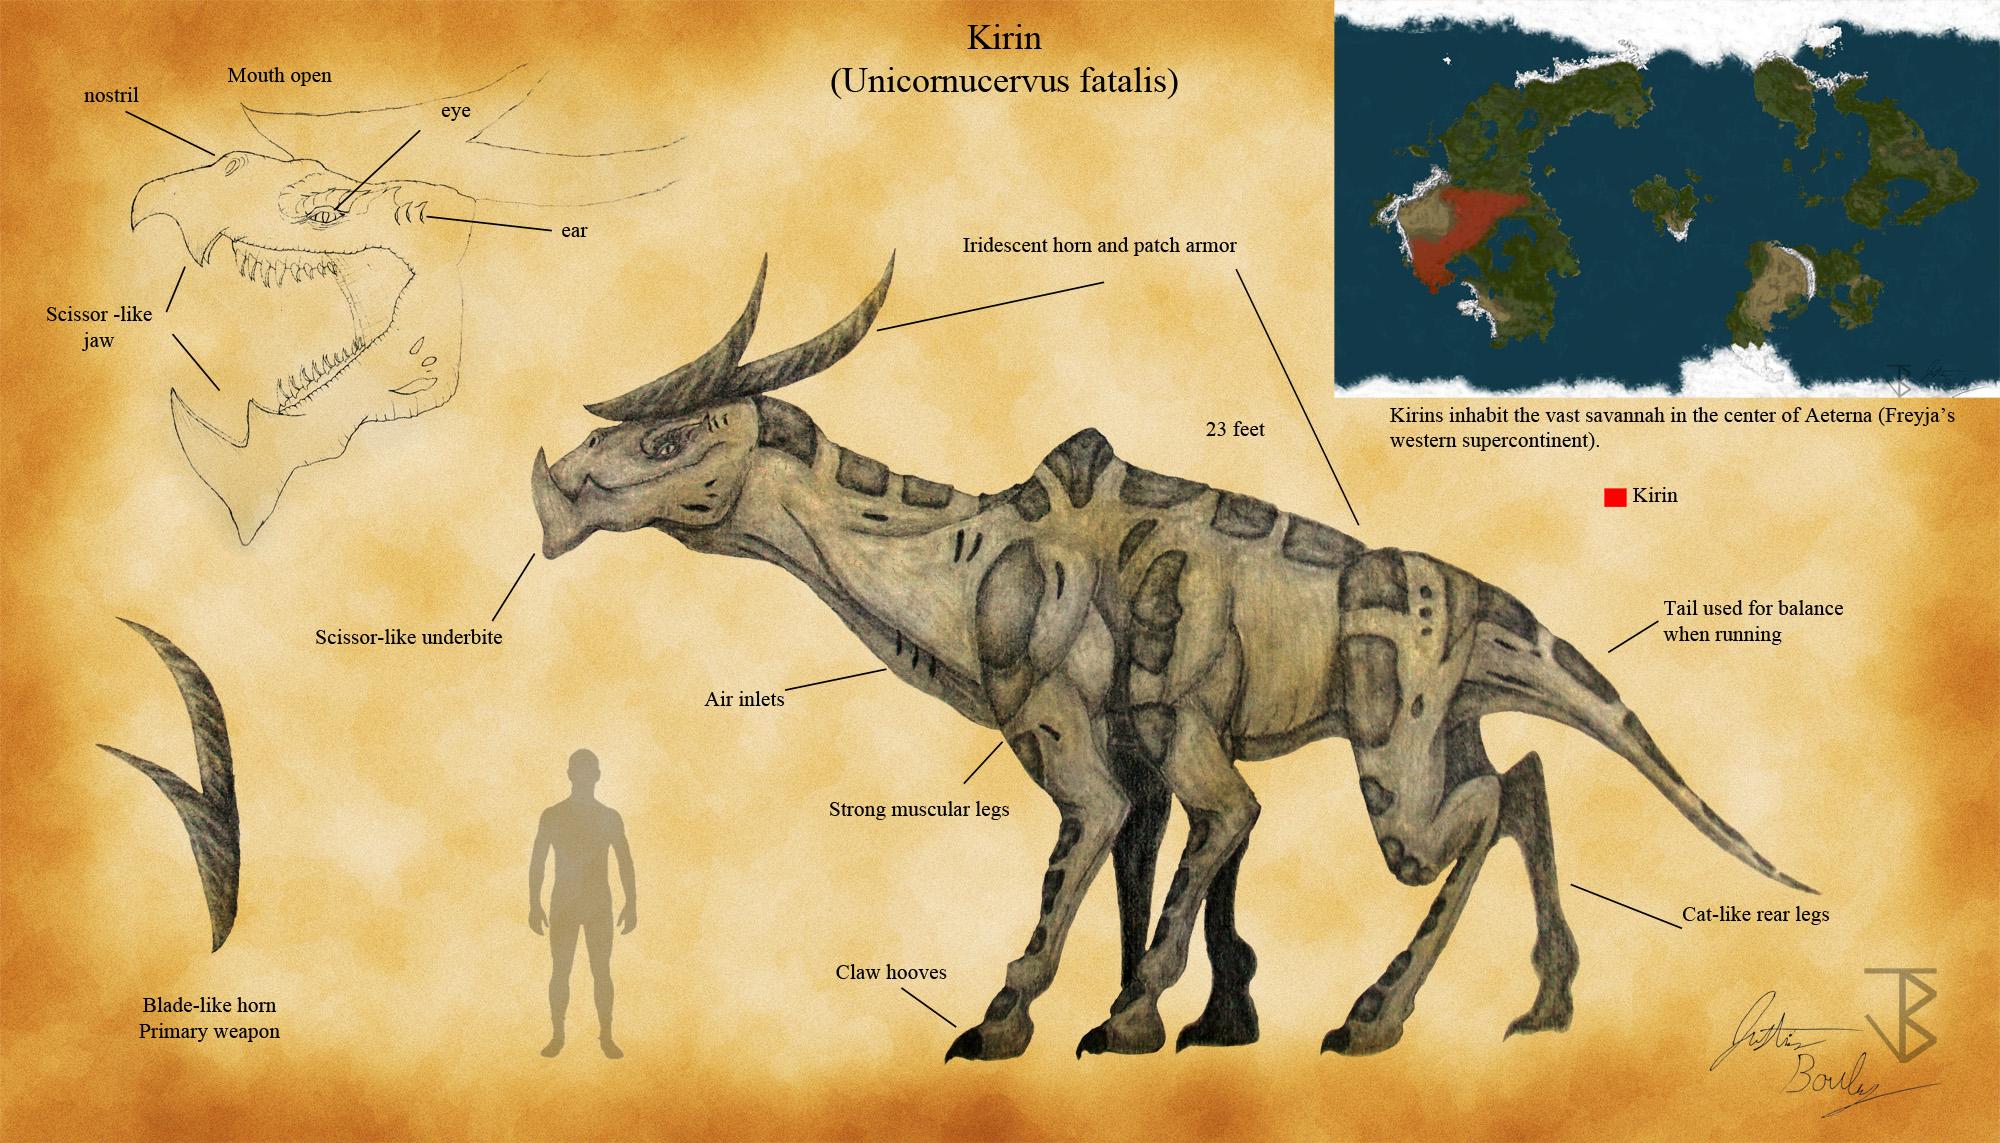 Kirin (Unicornucervus fatalis) by jbconcepts87